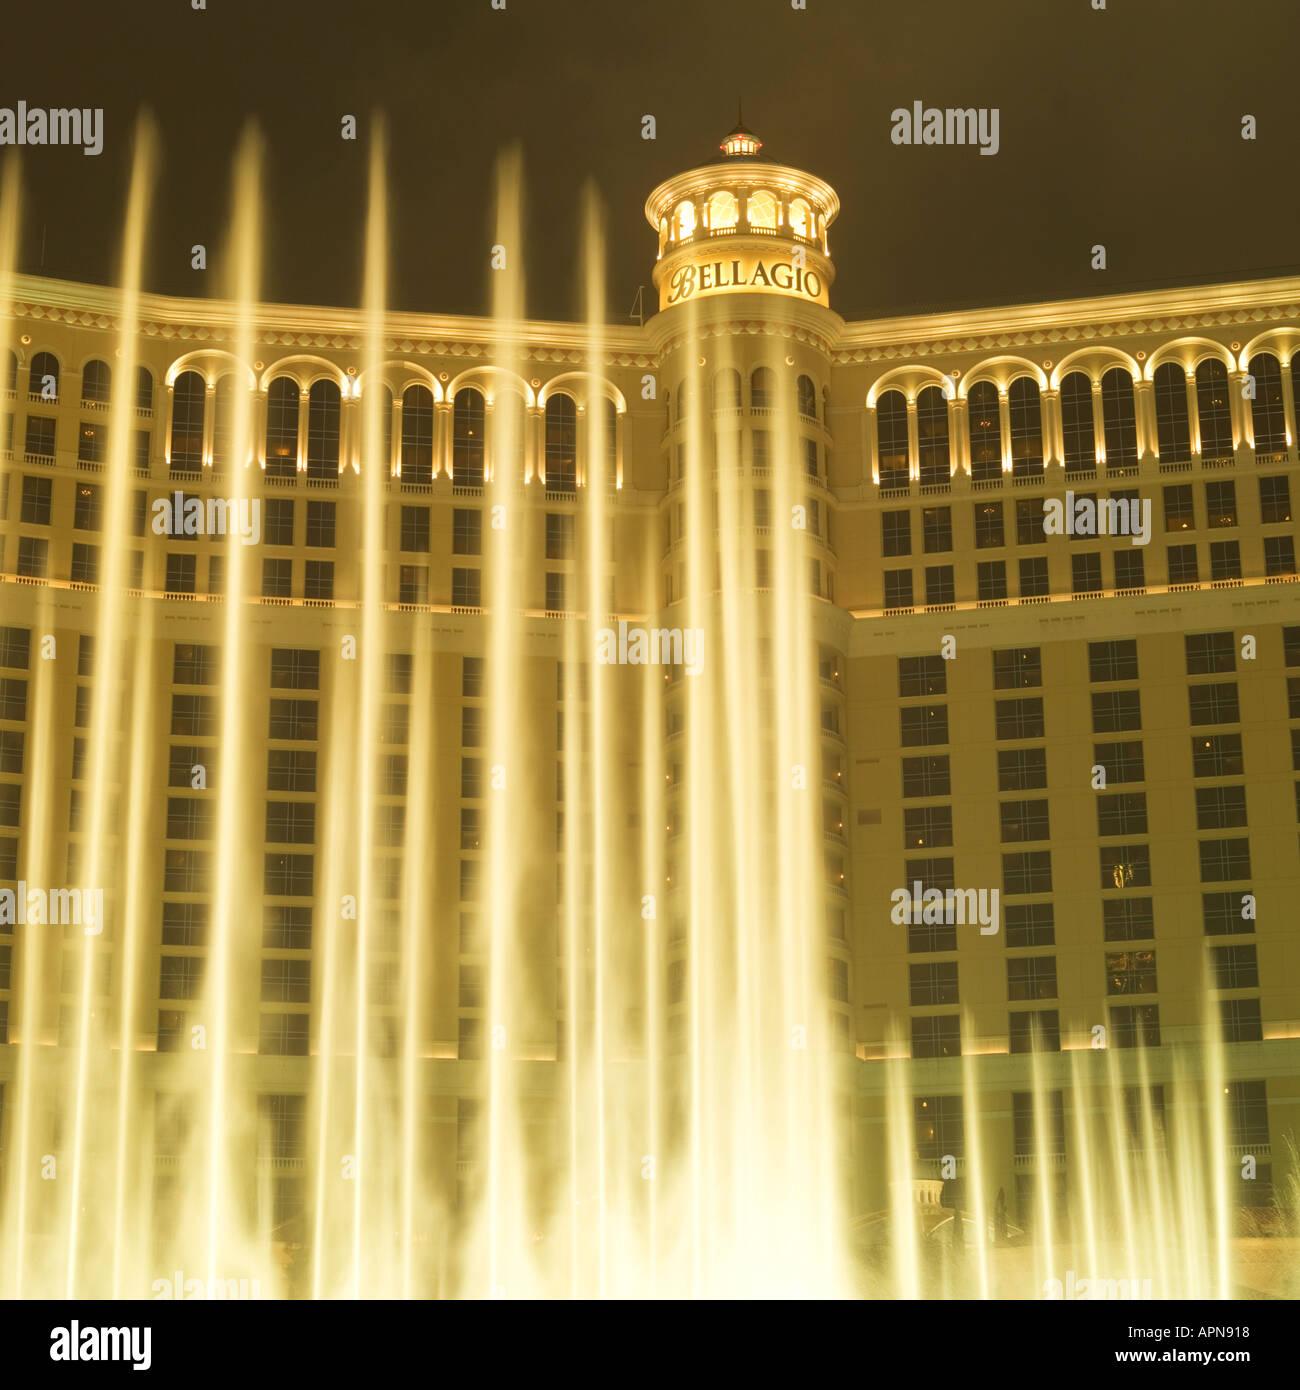 Fountain Show at Bellagio Las Vegas USA - Stock Image